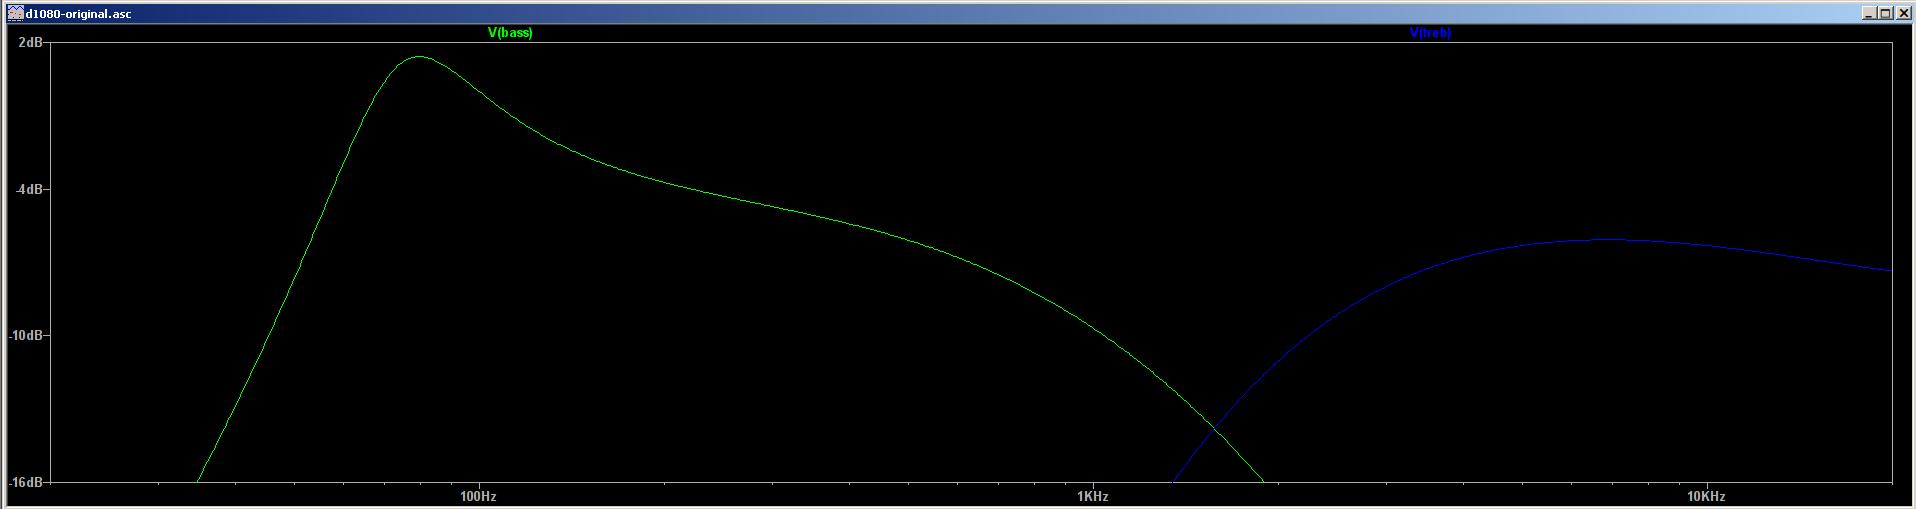 Diyaudio Blog Entries Crossover Schematic D1080 Mkii 08 Actives